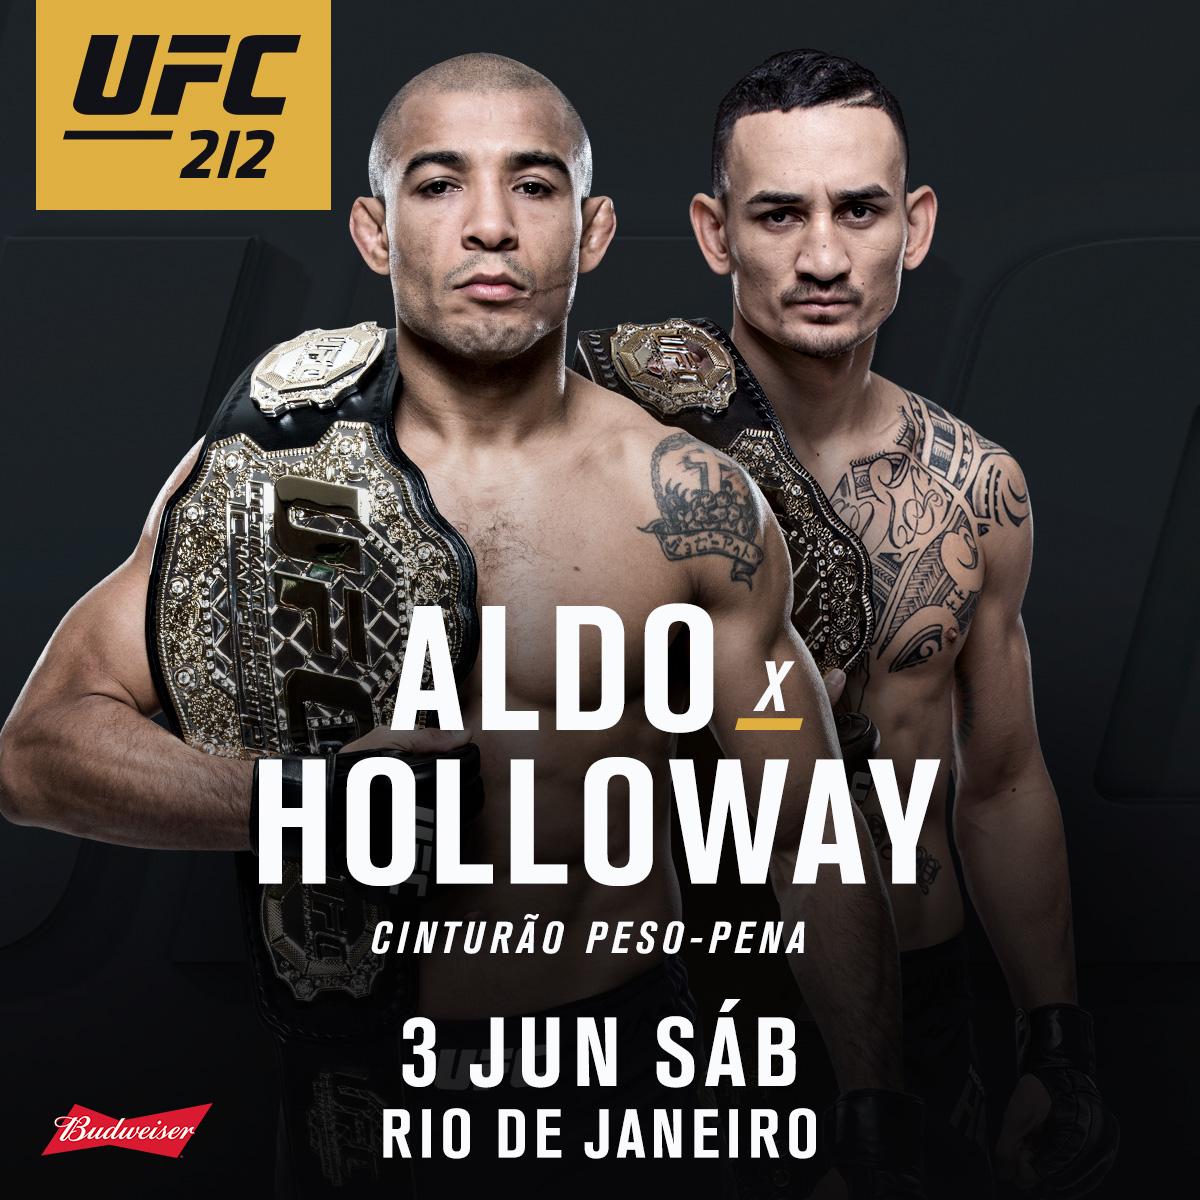 UFC 212: José Aldo vs. MaxHolloway